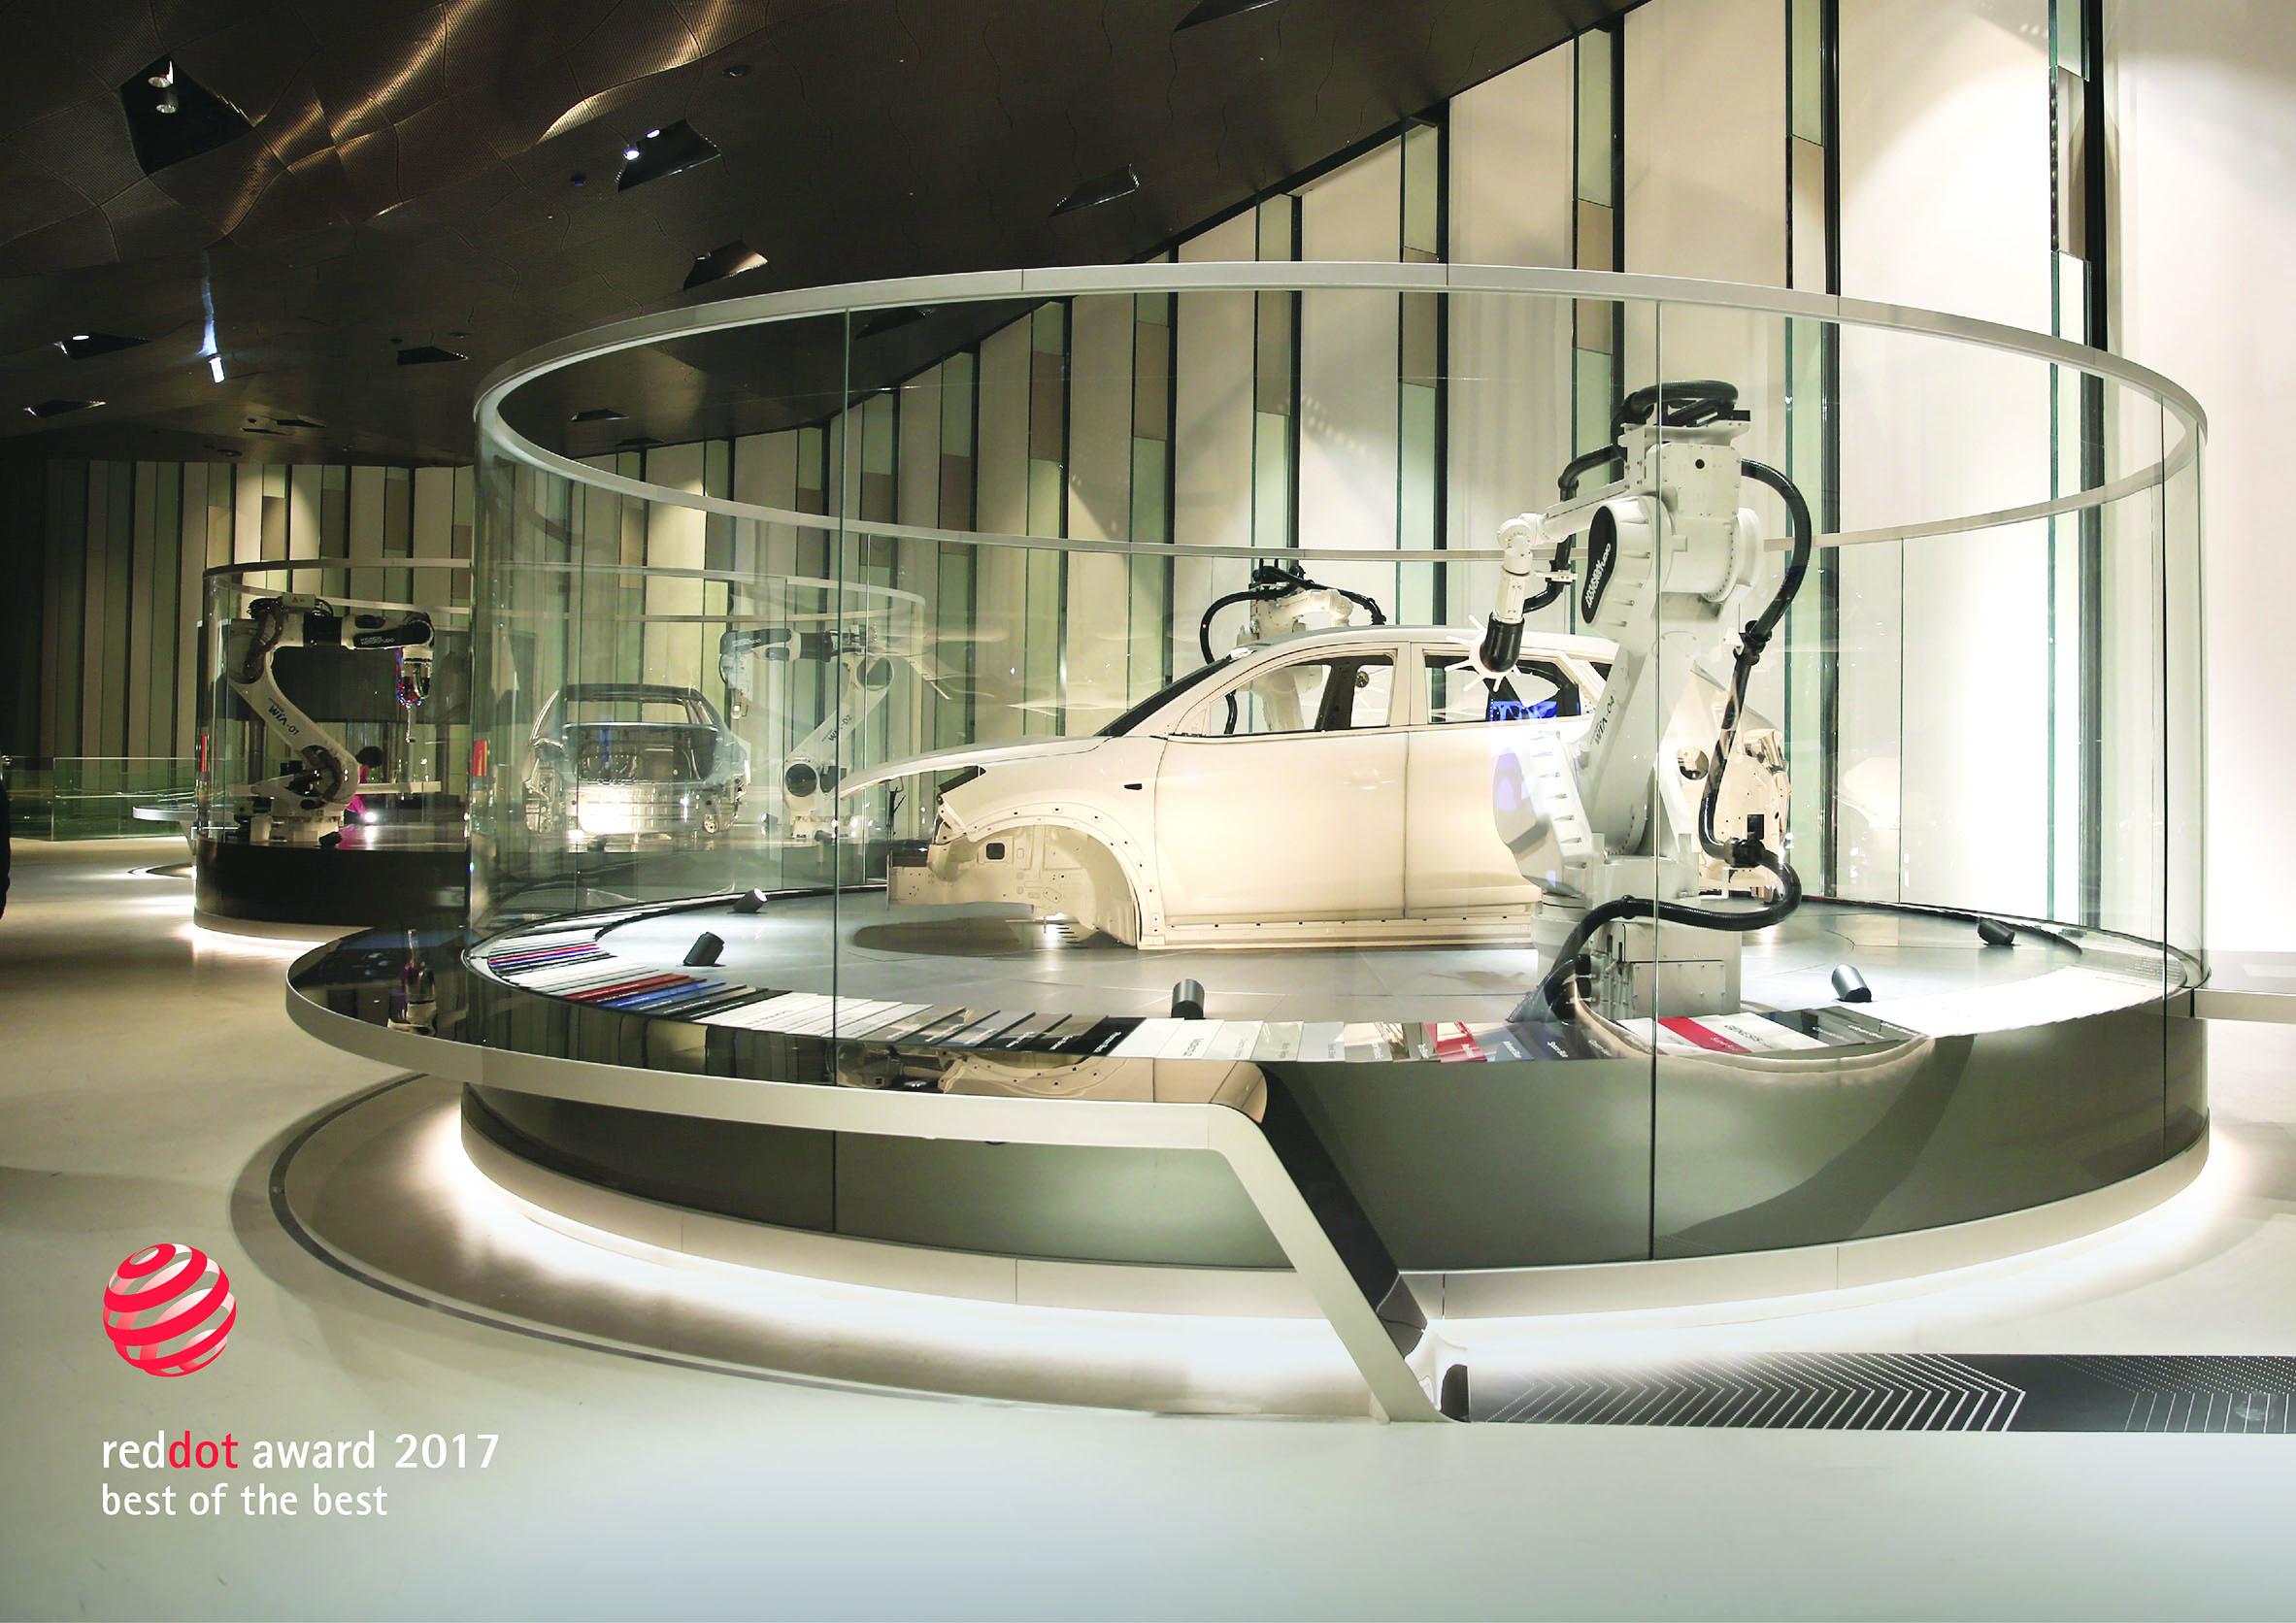 «هيونداي موتور» تحصد 5 جوائز من ريد دوت للتصميم